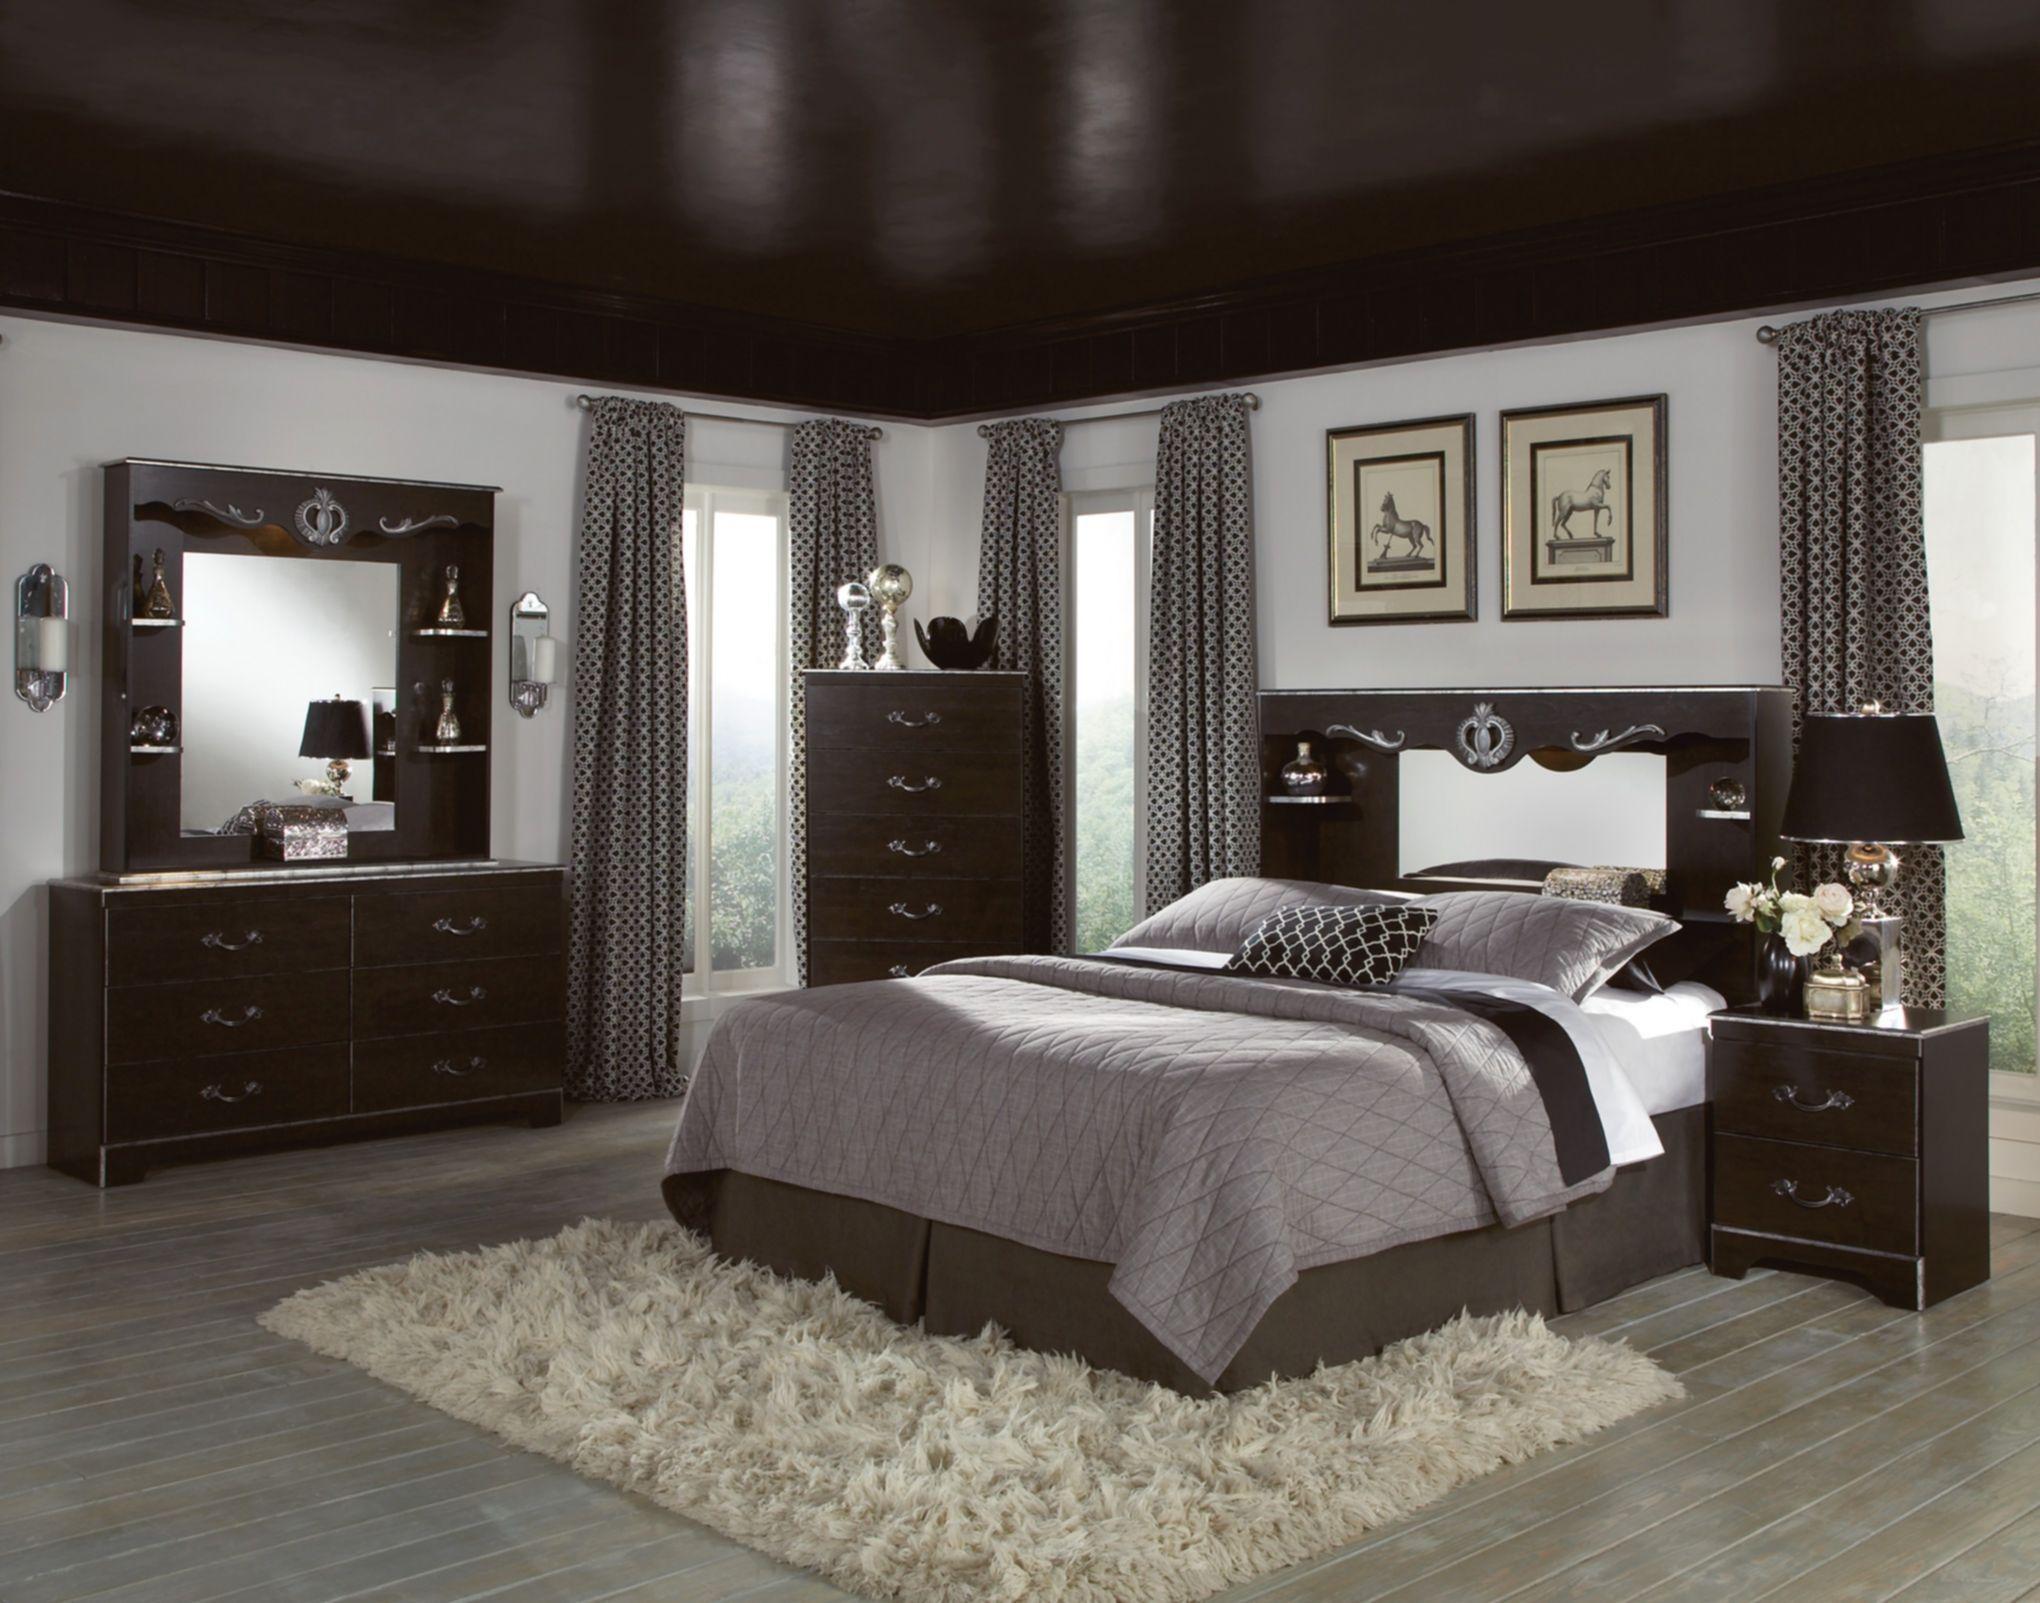 Incredible 25+ Bedroom Furniture Decorating Ideas Dark